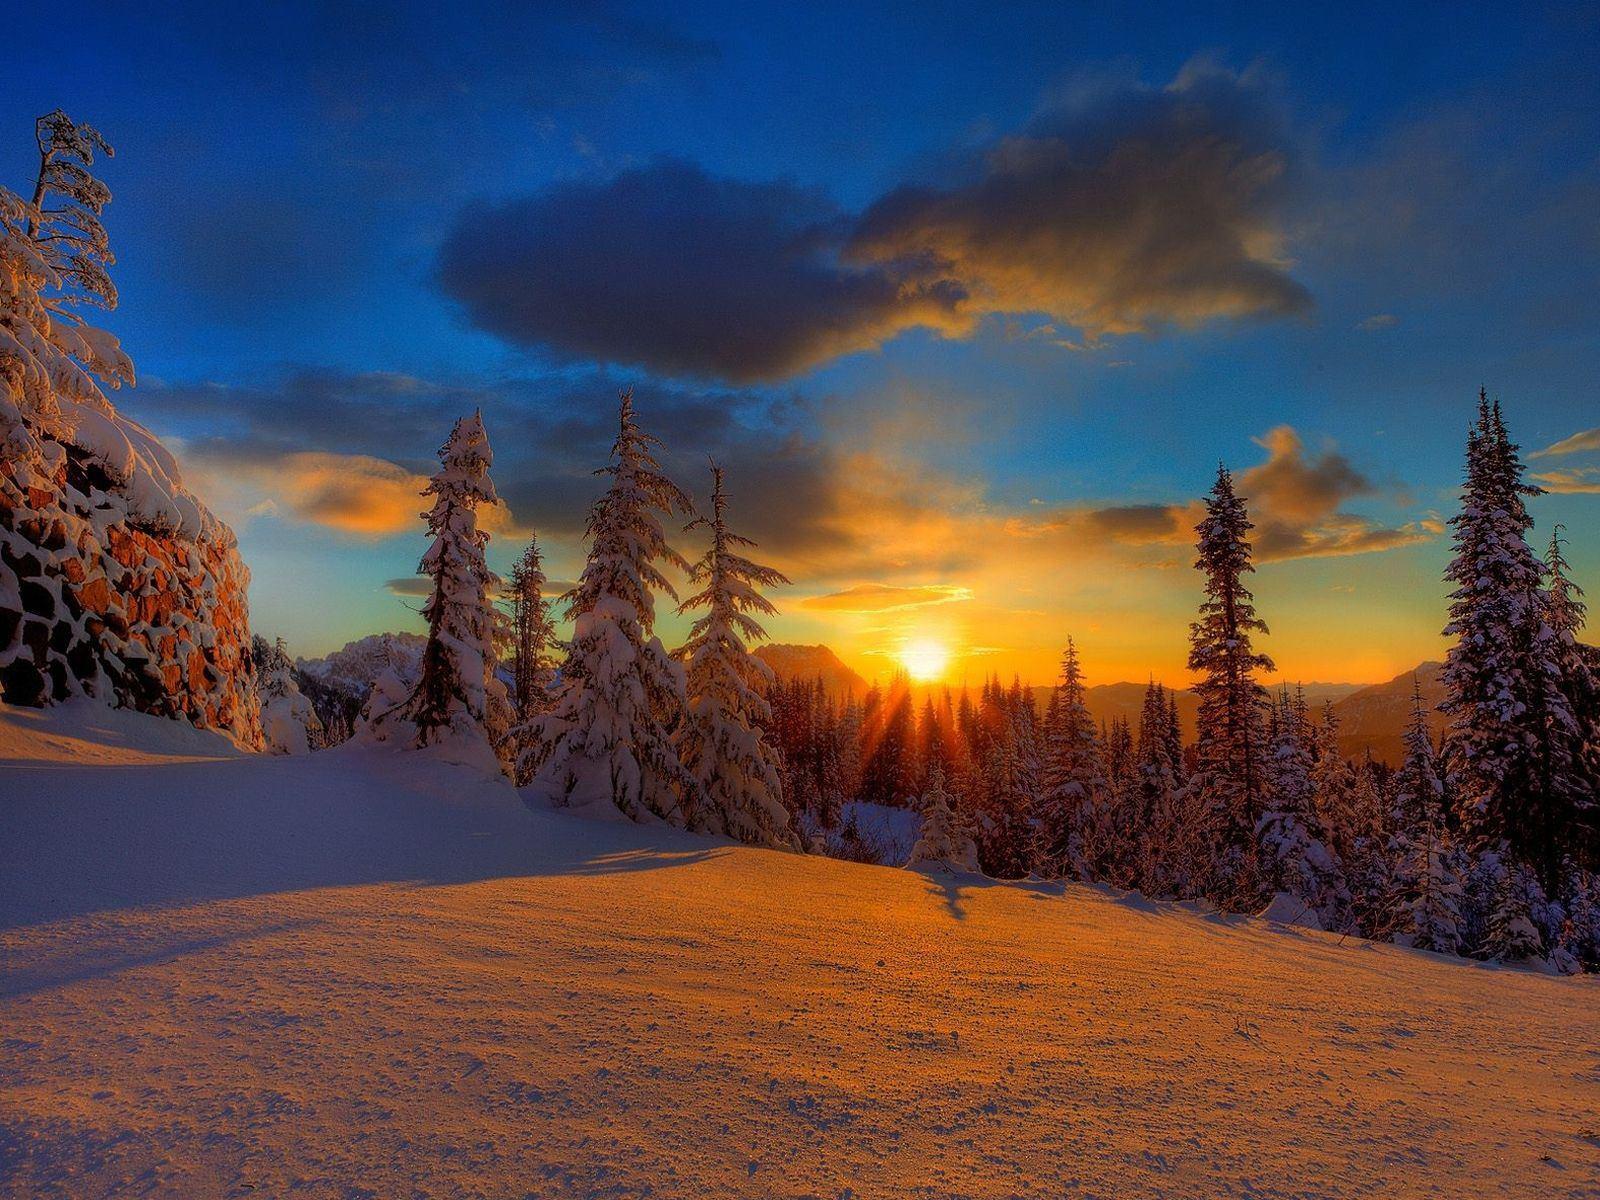 sun_decline_evening_snow_trees_firtrees_shade__x